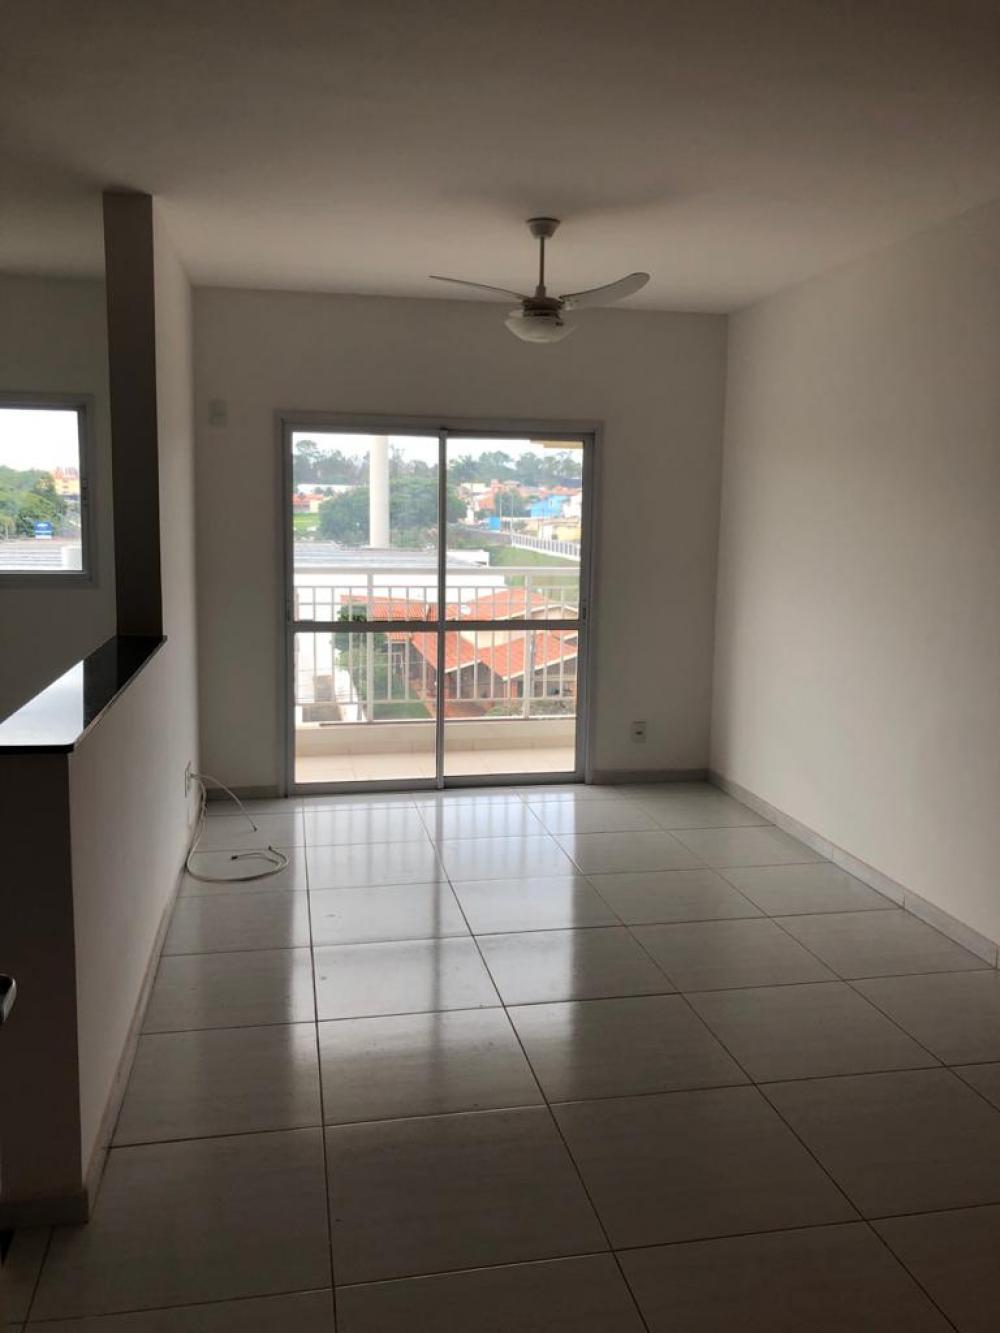 SAO JOSE DO RIO PRETO Apartamento Locacao R$ 1.600,00 Condominio R$600,00 3 Dormitorios 1 Suite Area construida 111.00m2